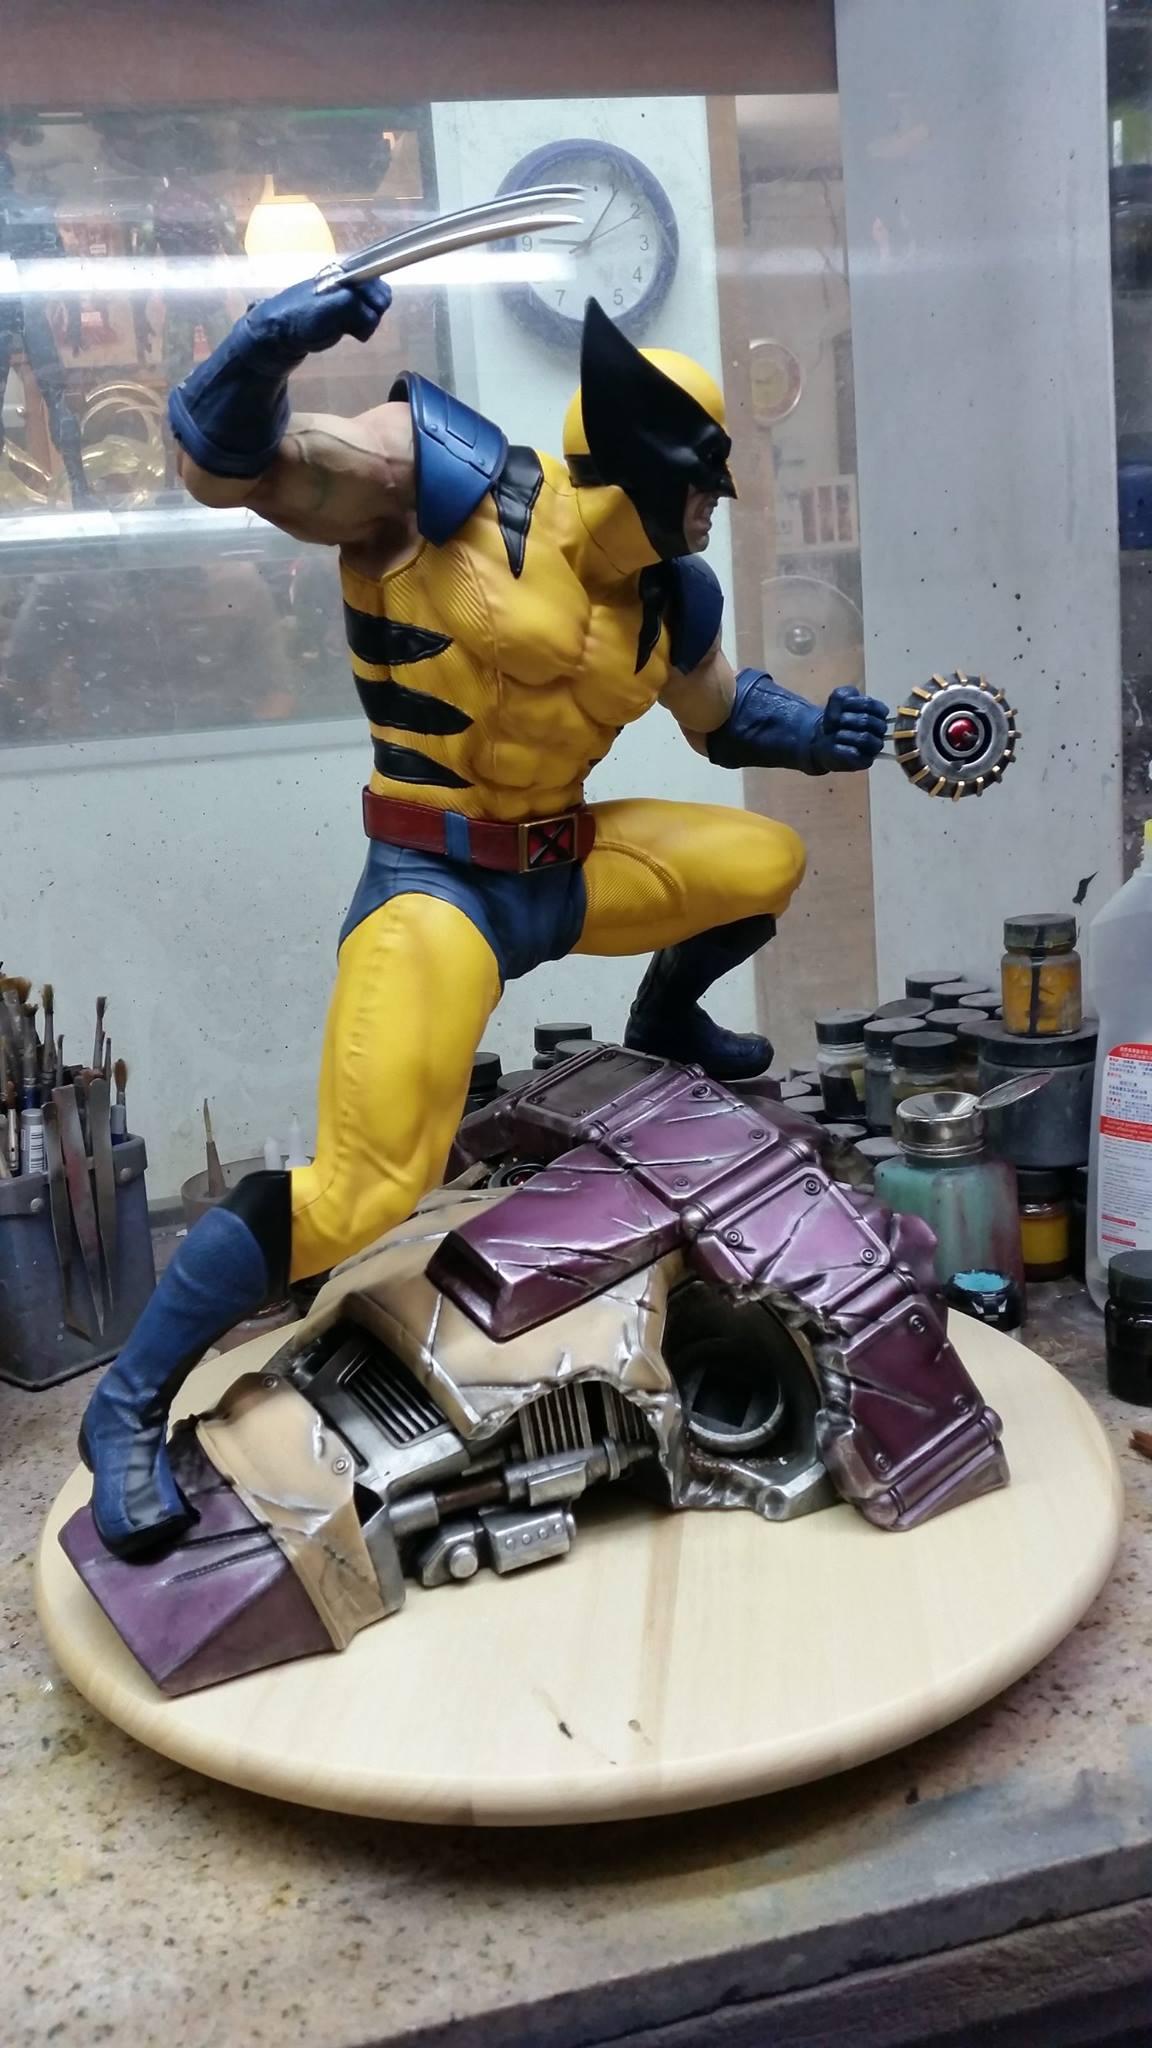 Premium Collectibles : Wolverine - Comics Version - Page 2 8053991034421614171090251764592395685379845609398o